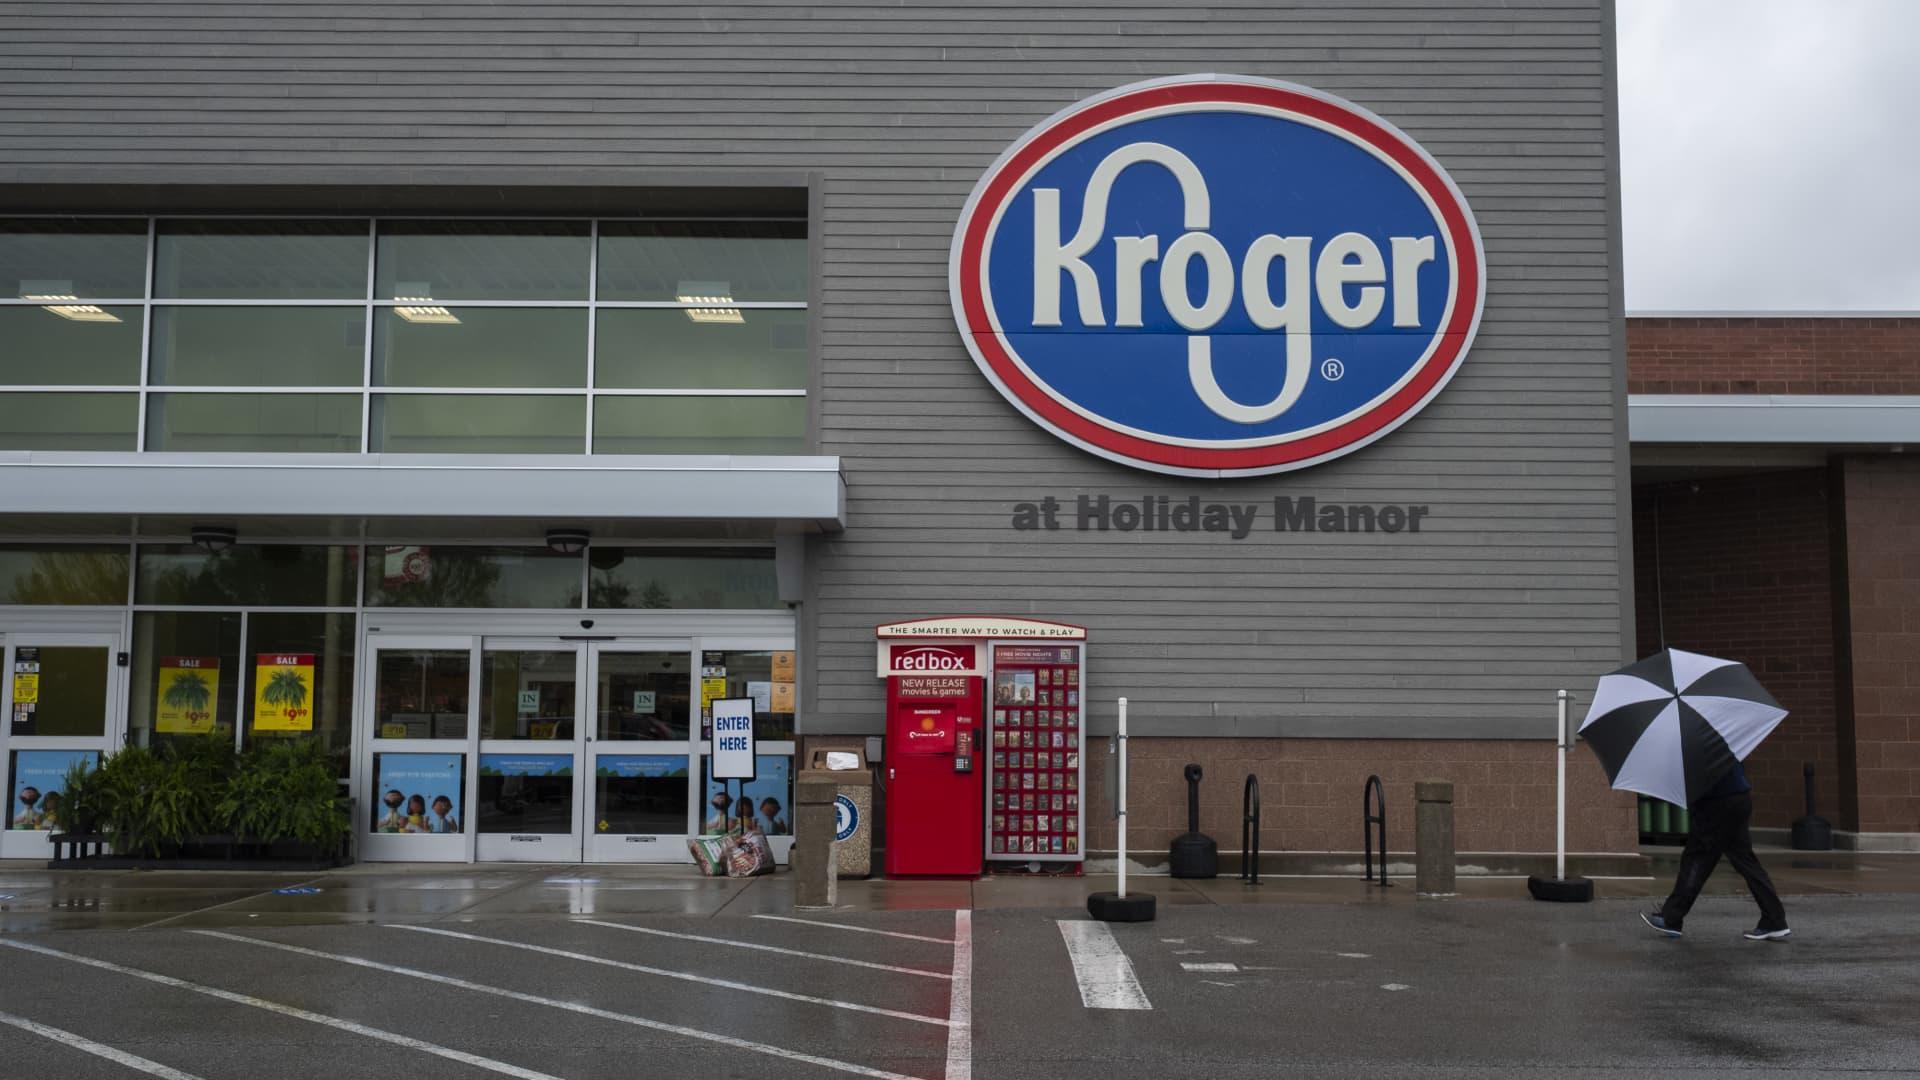 A shopper holding an umbrella walks towards a Kroger Co. grocery store in Louisville, Kentucky, U.S., on Sunday, April 26, 2020.